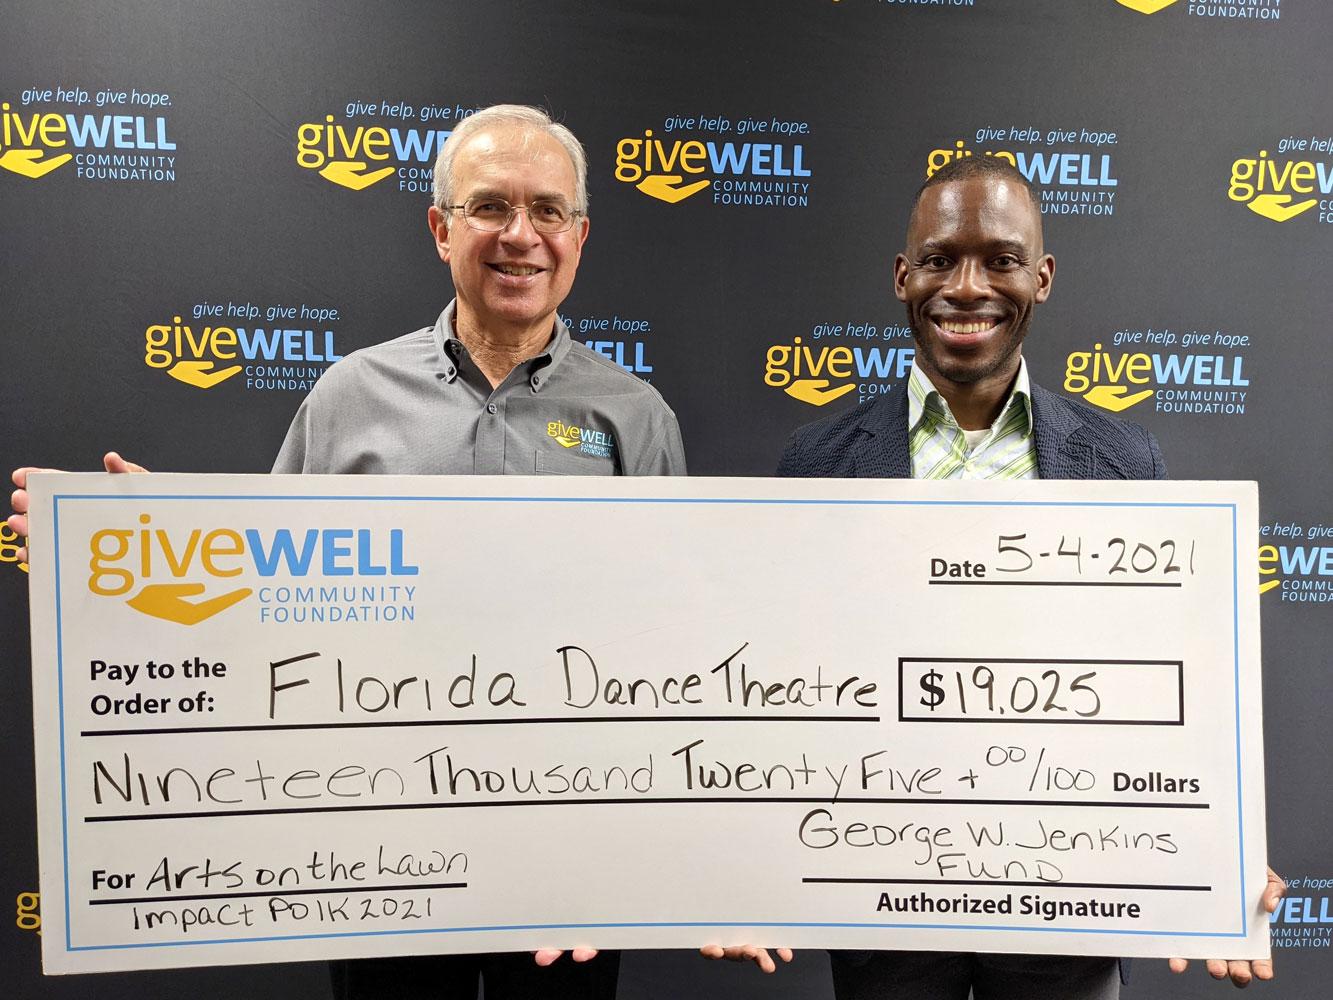 Impact Polk check presentation with Florida Dance Theatre